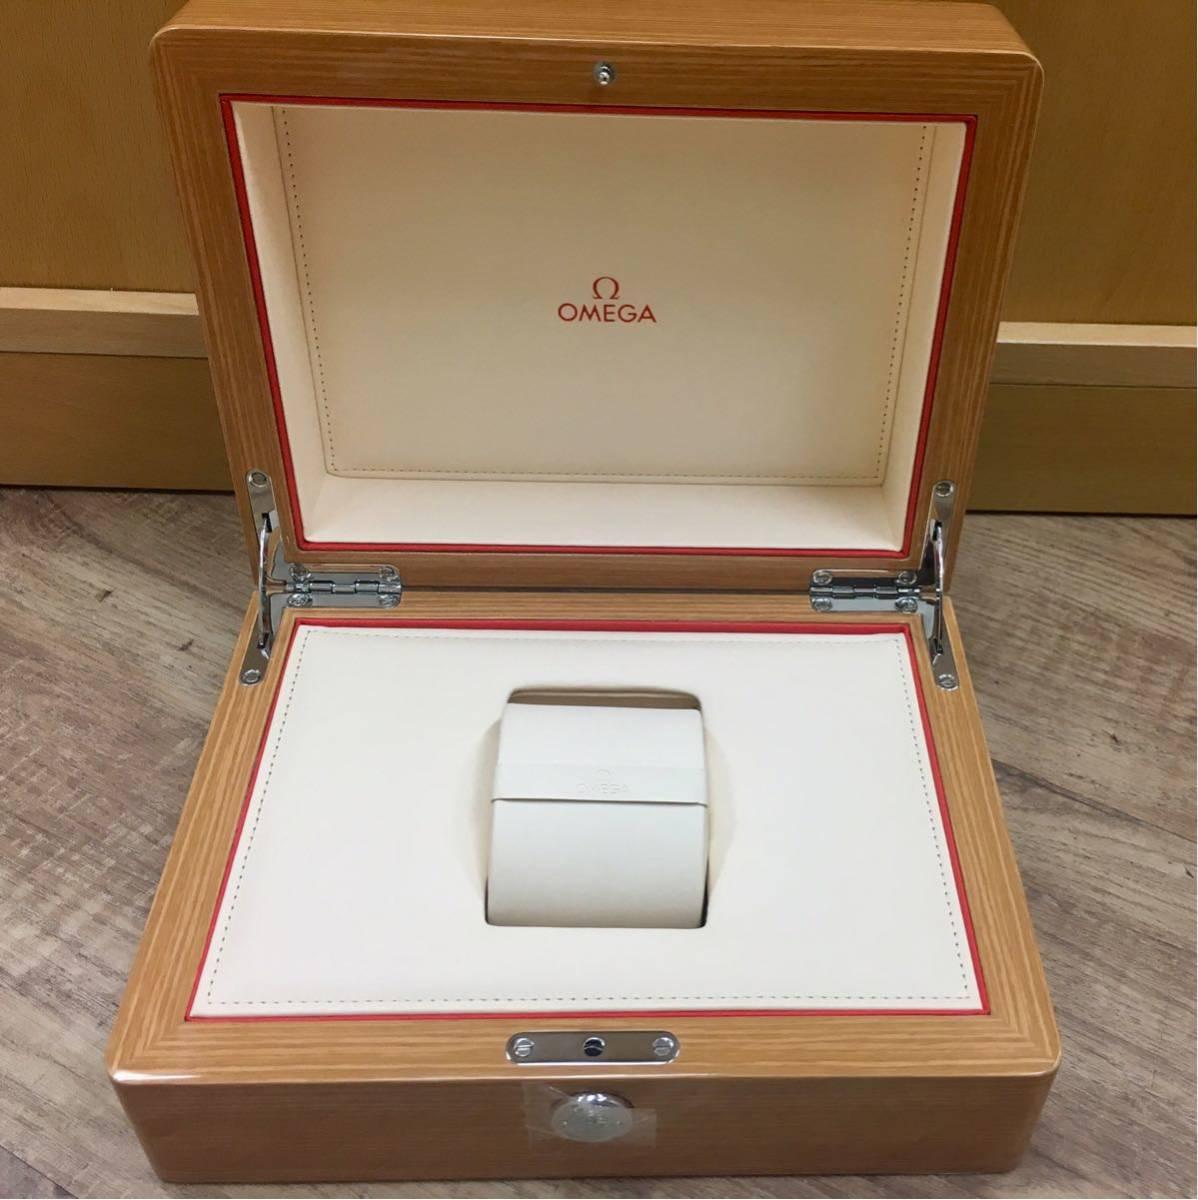 OMEGA オメガ 腕時計 空箱 木製 化粧箱_画像3